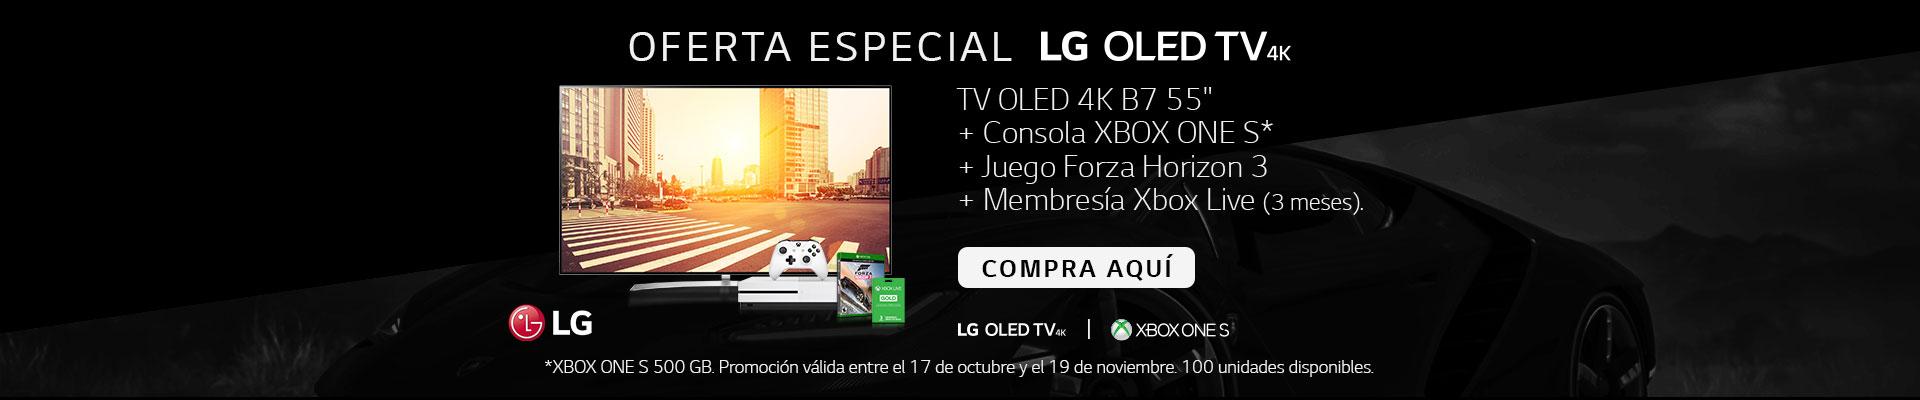 PPAL KT-3-TELEVISOR LG+XBOX ONE-TV-OCTU18-20